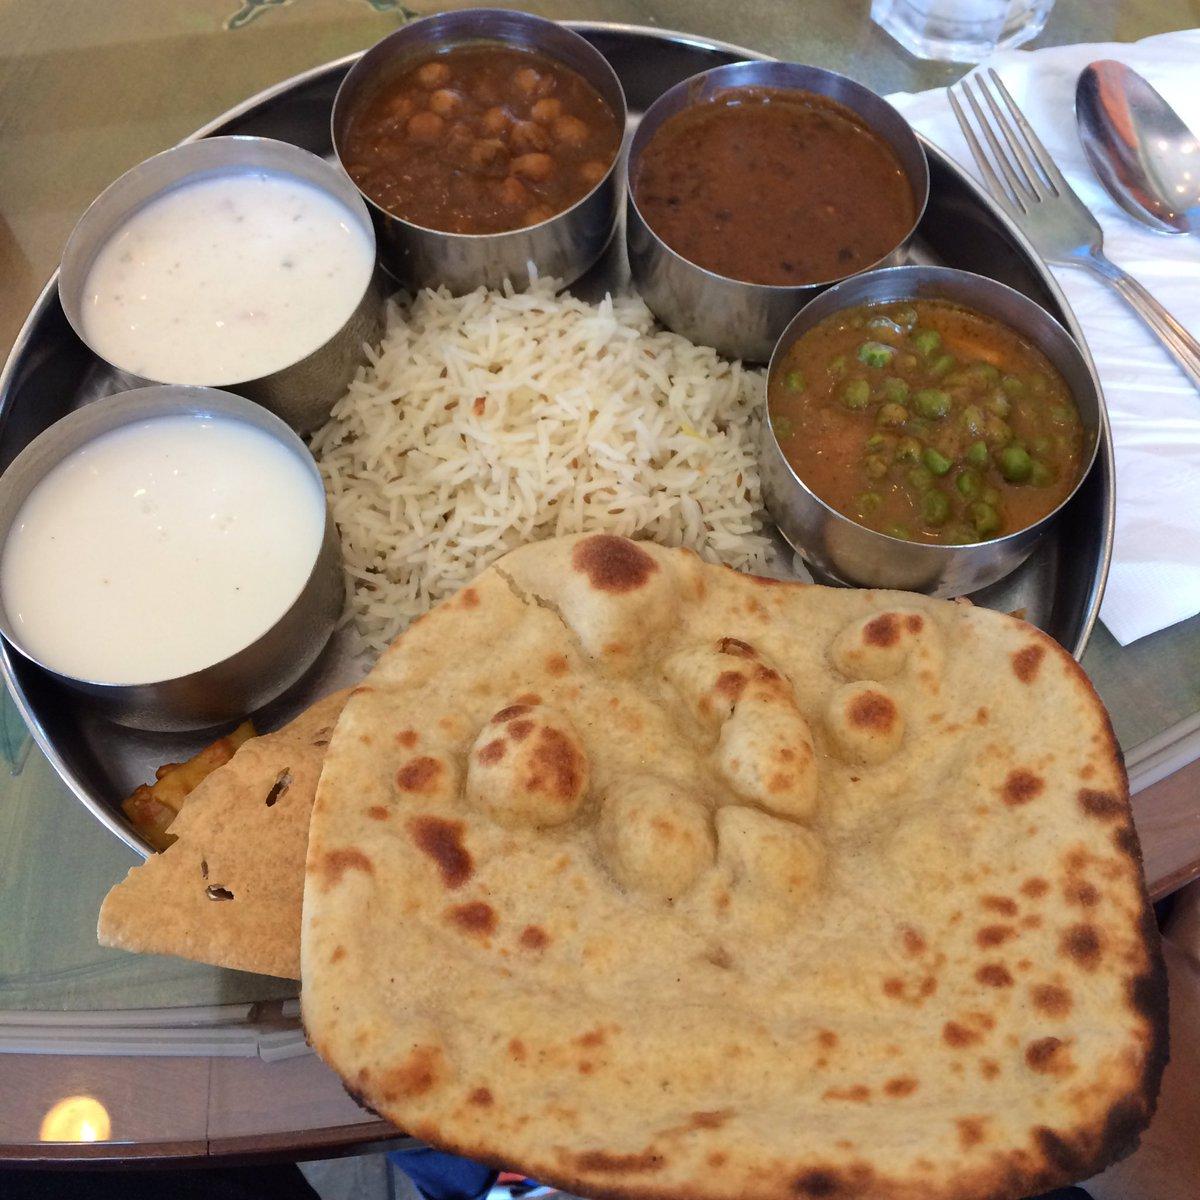 Tandoori kitchen -  Thali Naan Rice Daal Channa Malai Kofta Roti Chef Tandoori Kitchen Mumbai Punjabi Https T Co Ln5i4pnmet